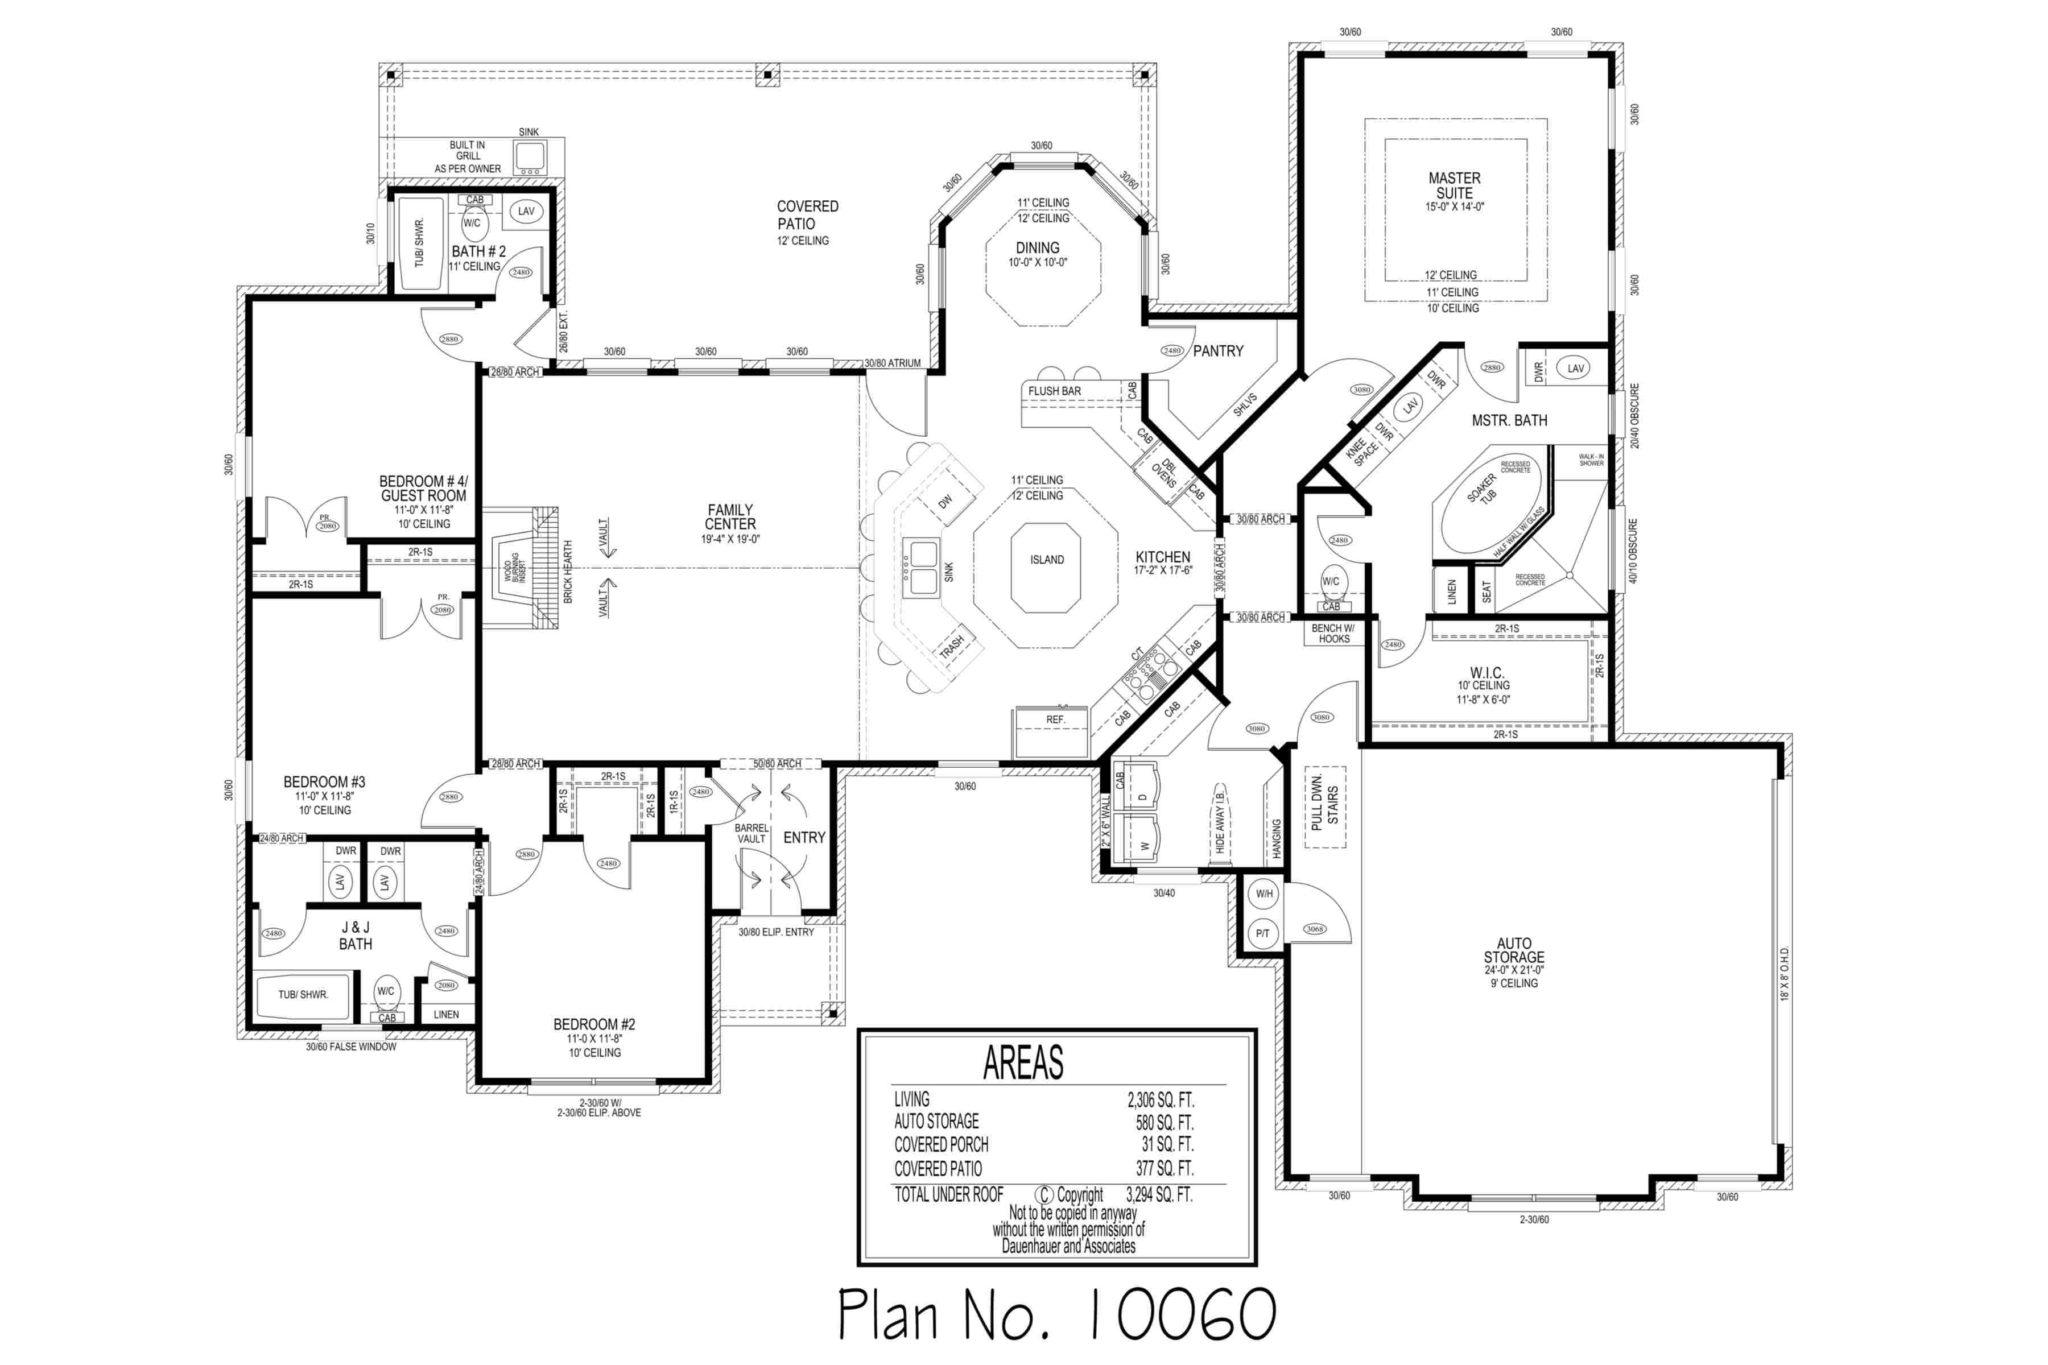 house-plan-10060-floor